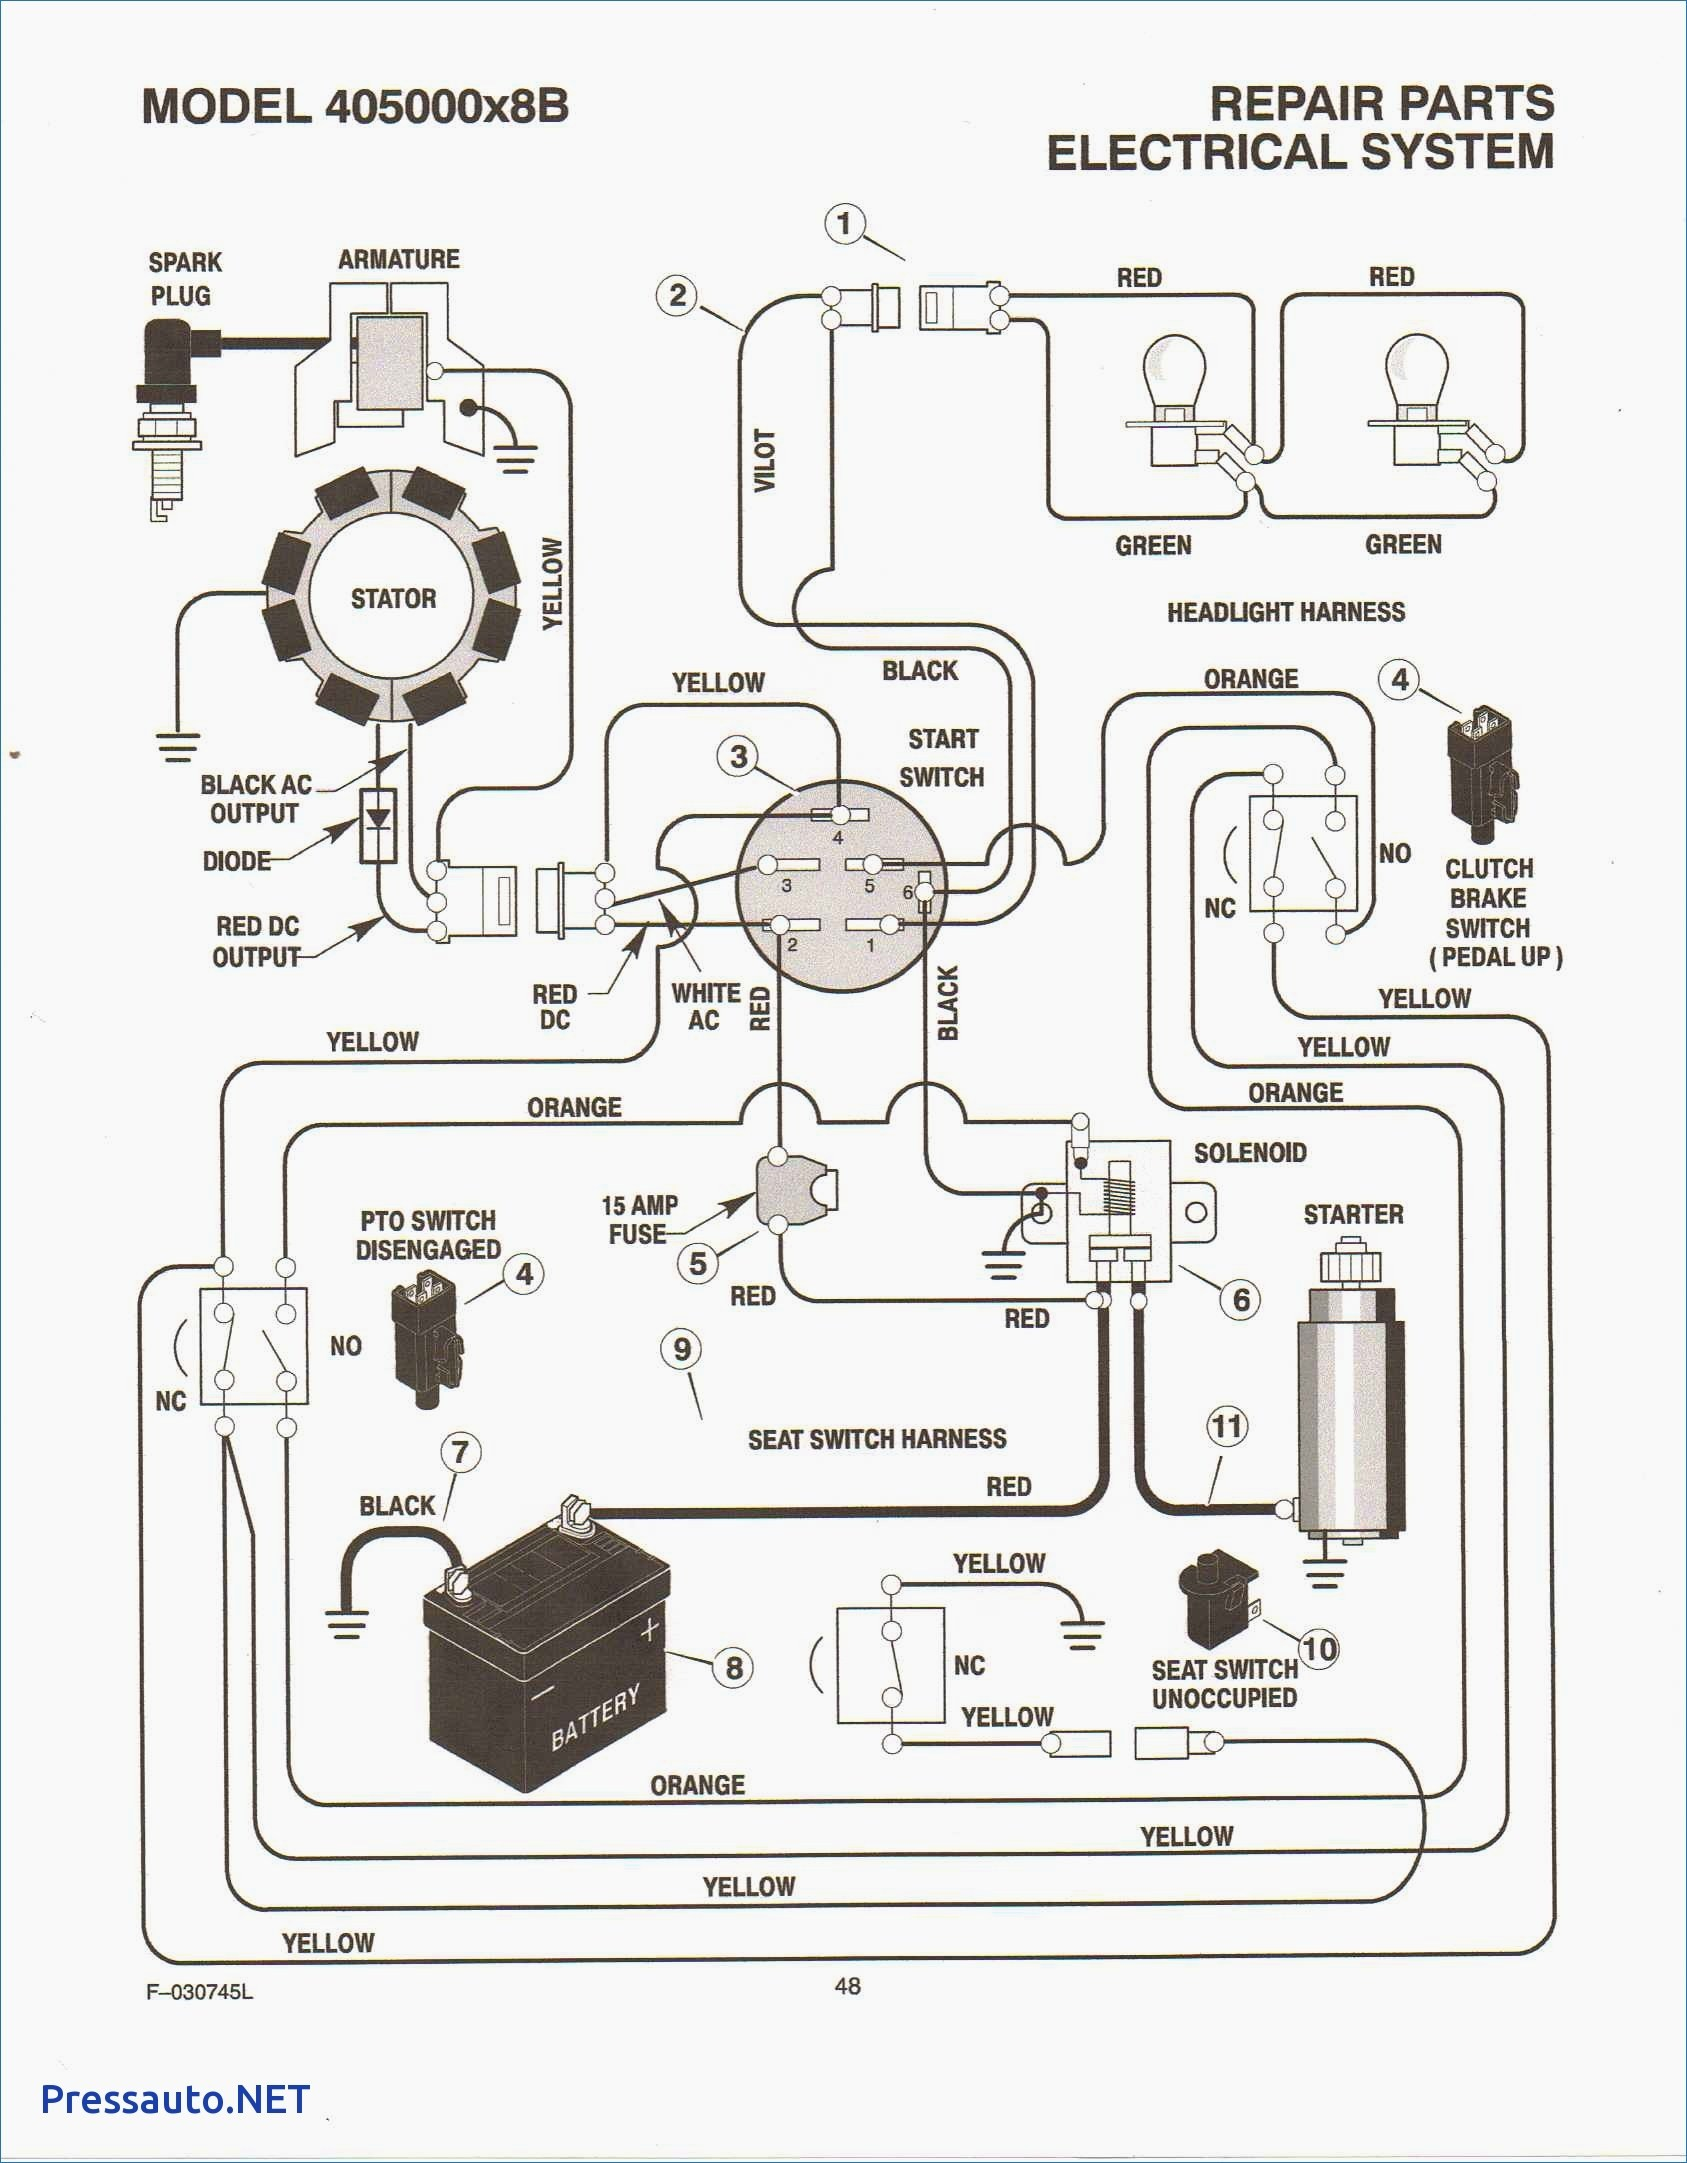 John Deere 180 Wiring Diagram - Wiring Diagram Meta on john deere 3020 diagram, john deere 3020 battery hookup, john deere 3020 generator, john deere 3020 oil cooler, john deere 3020 motor, john deere 3020 engine, john deere 3020 fender, john deere 3020 coil, john deere 3020 headlights, john deere 4020 wiring diagram, john deere 3020 water pump, john deere tractor wiring, john deere 3020 spark plugs, john deere 3020 distributor, john deere 3020 fuel filter, john deere 3020 diesel, john deere radio harness, john deere 3020 solenoid, john deere 3020 manual, john deere 3020 resistor,